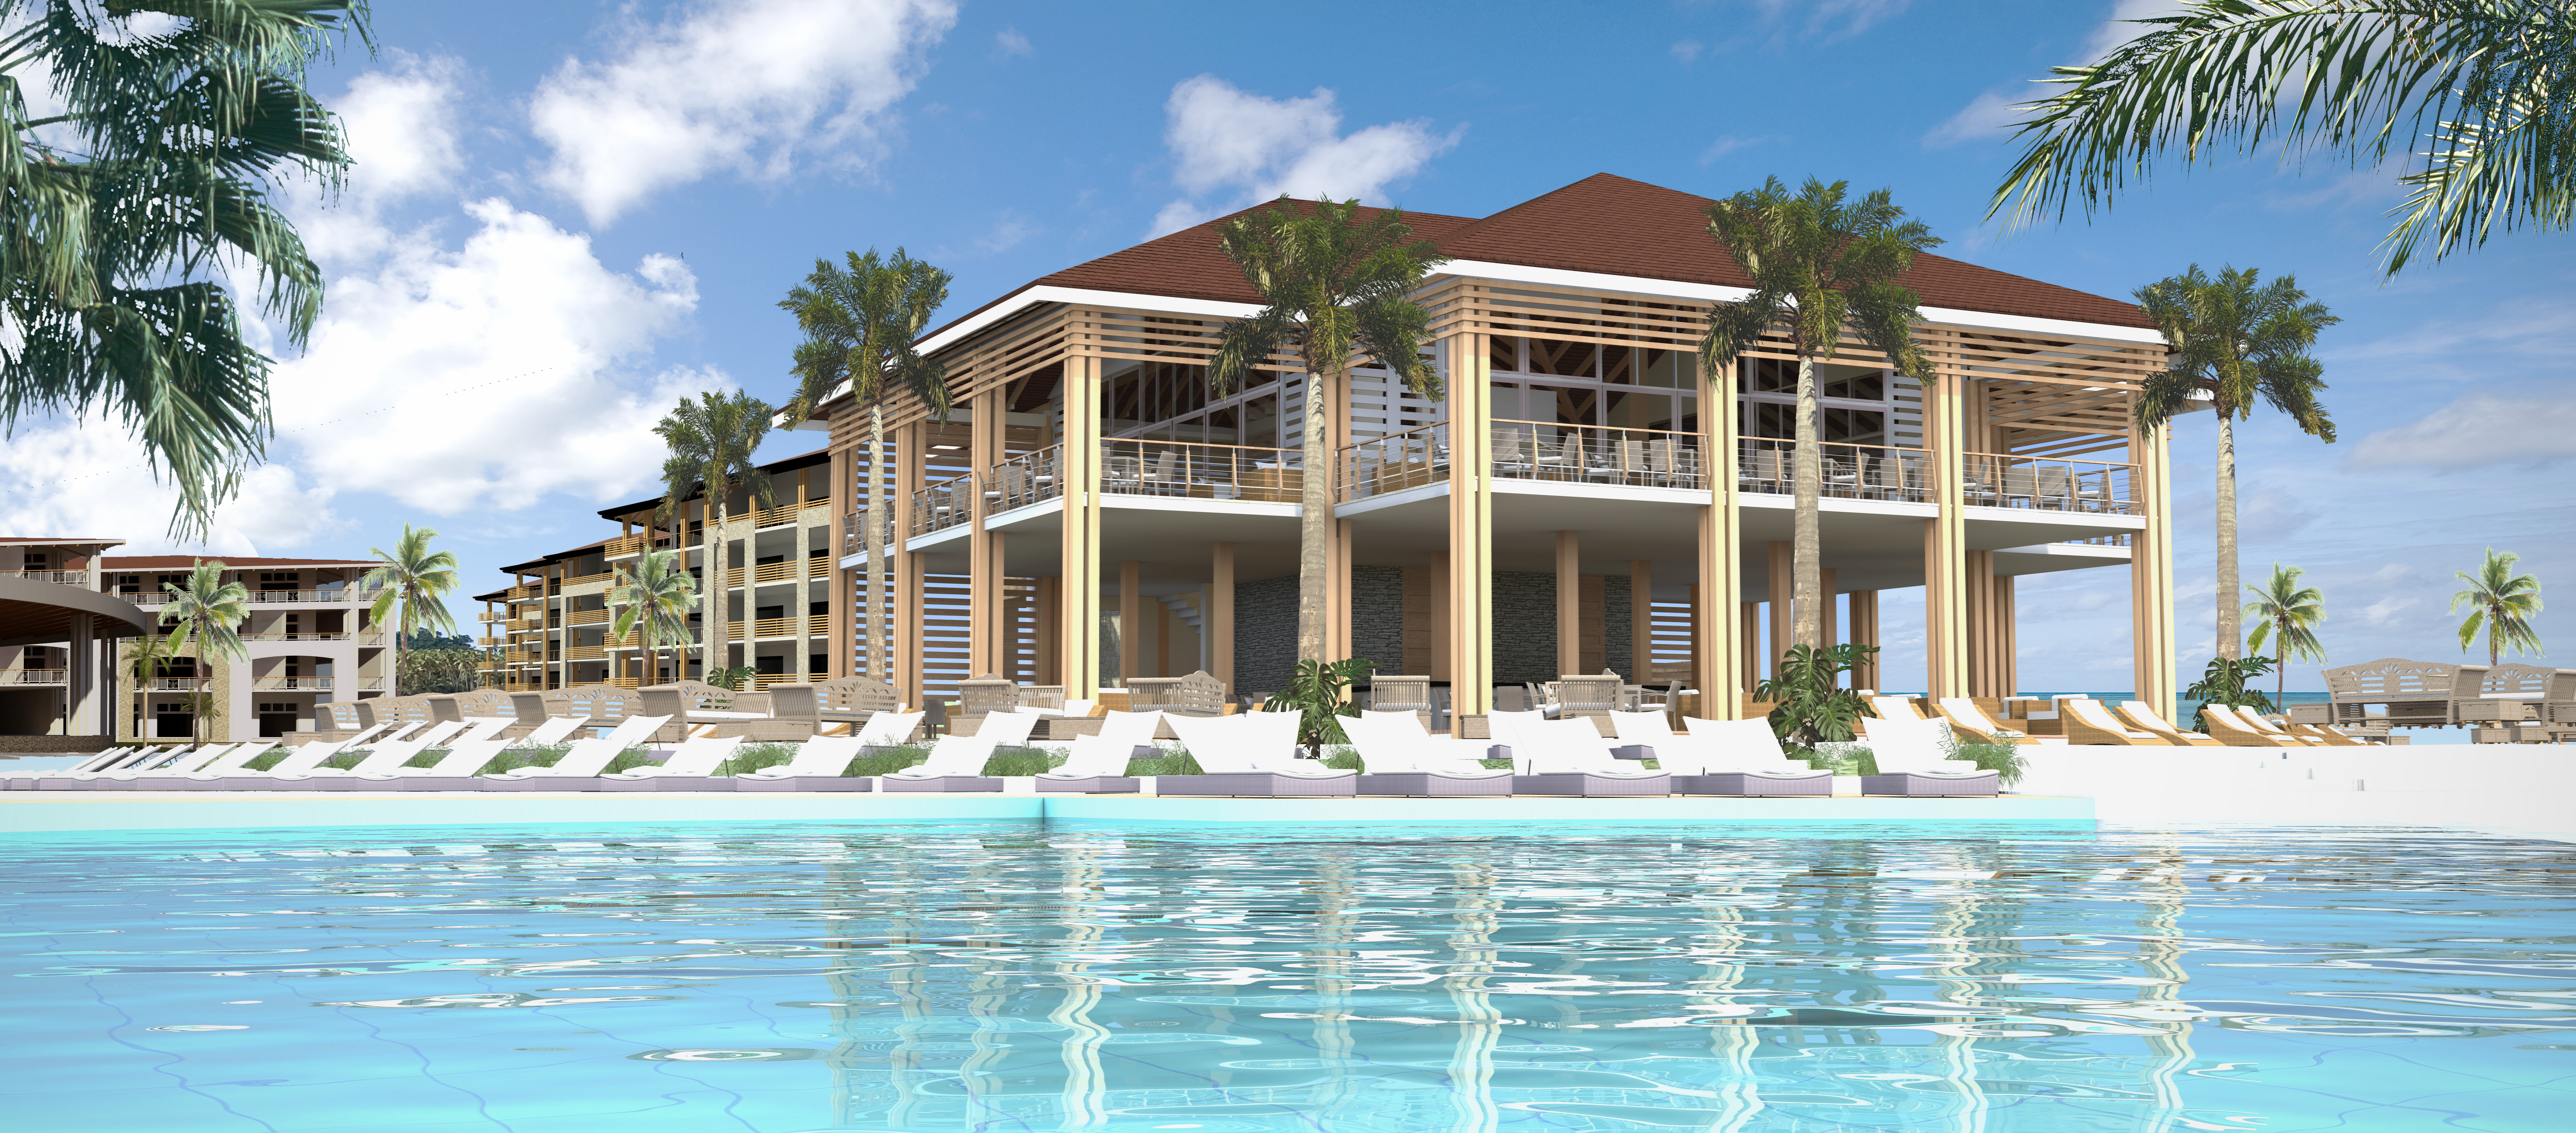 The Hideaway 171 Harlequin Hotels Amp Resorts Development Updates